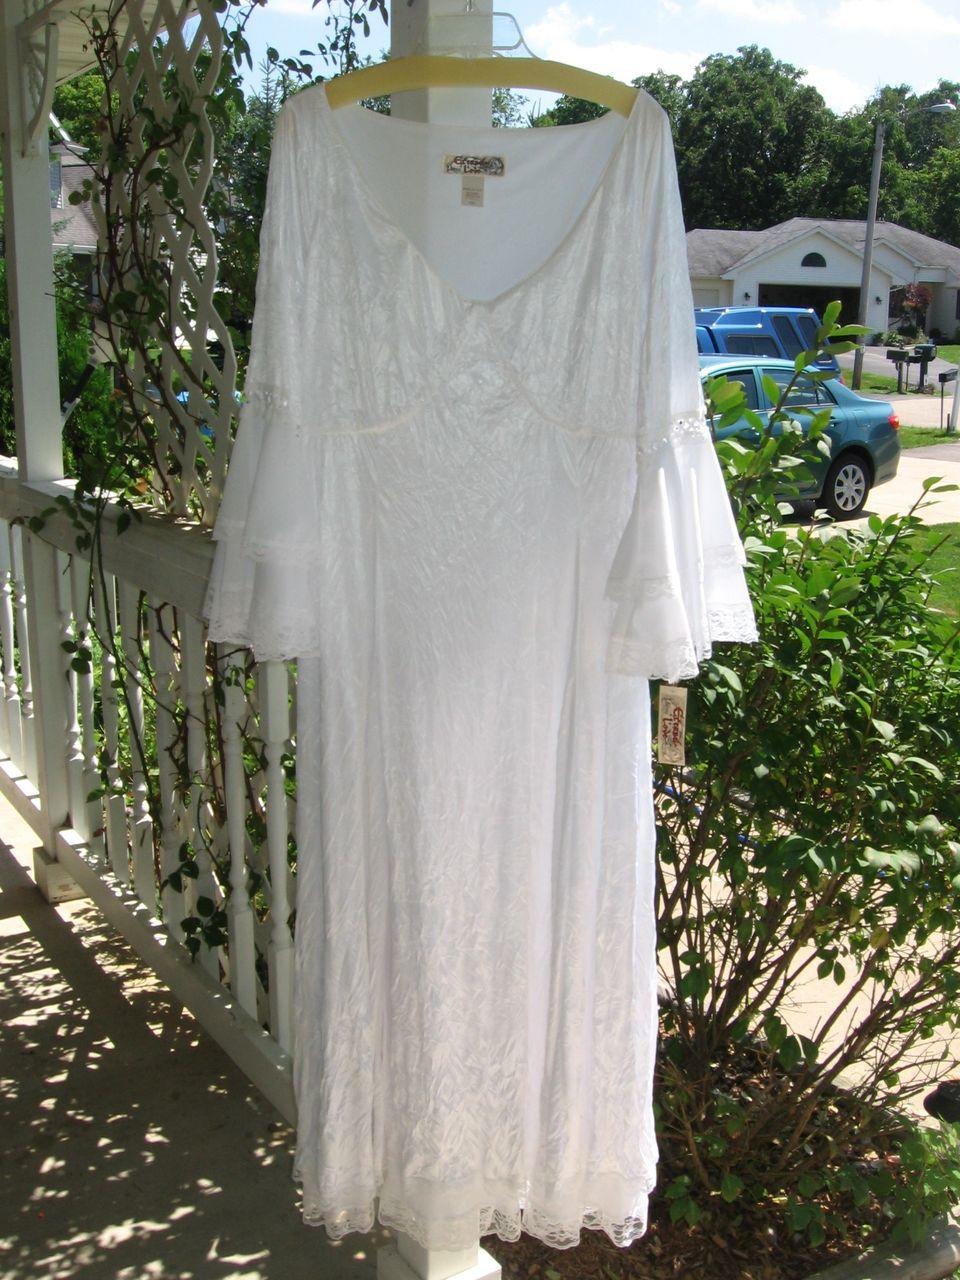 Cheap wiccan wedding dresses wedding short dresses cheap wiccan wedding dresses 26 junglespirit Gallery